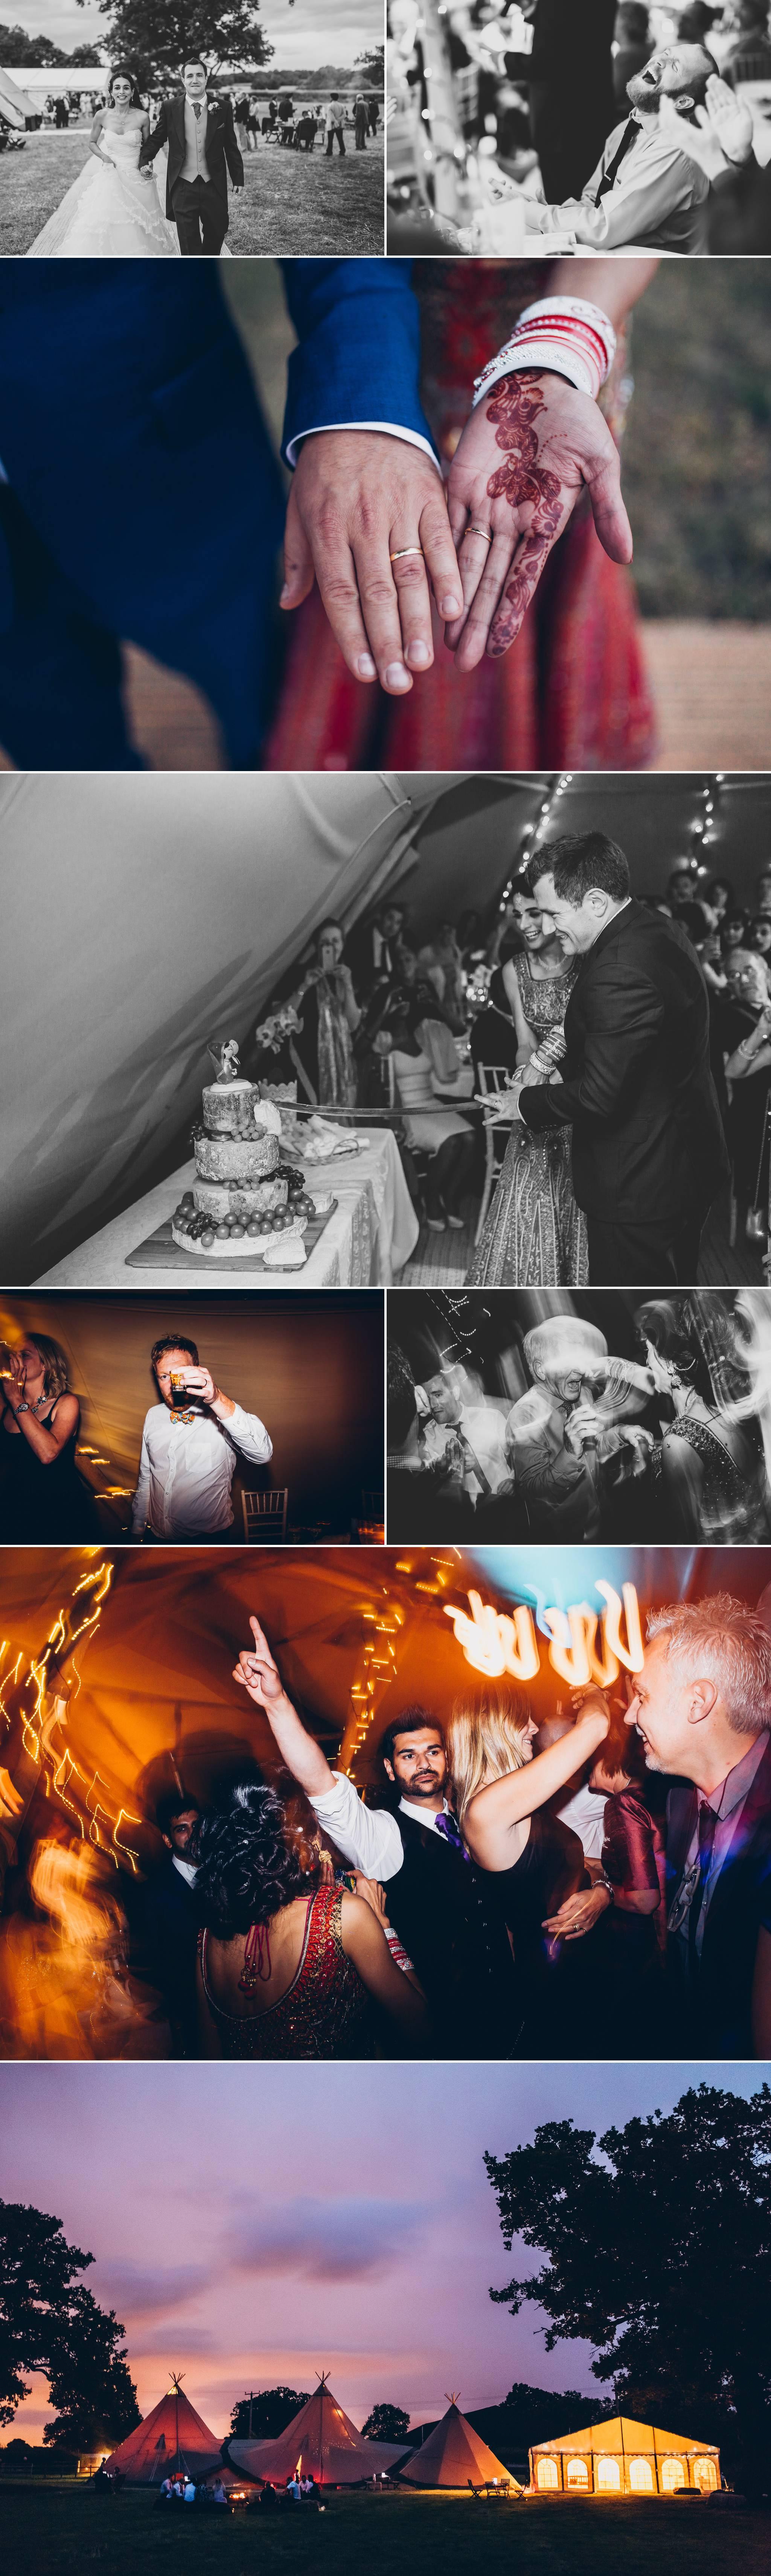 staffordshire-wedding-photographer 24.jpg